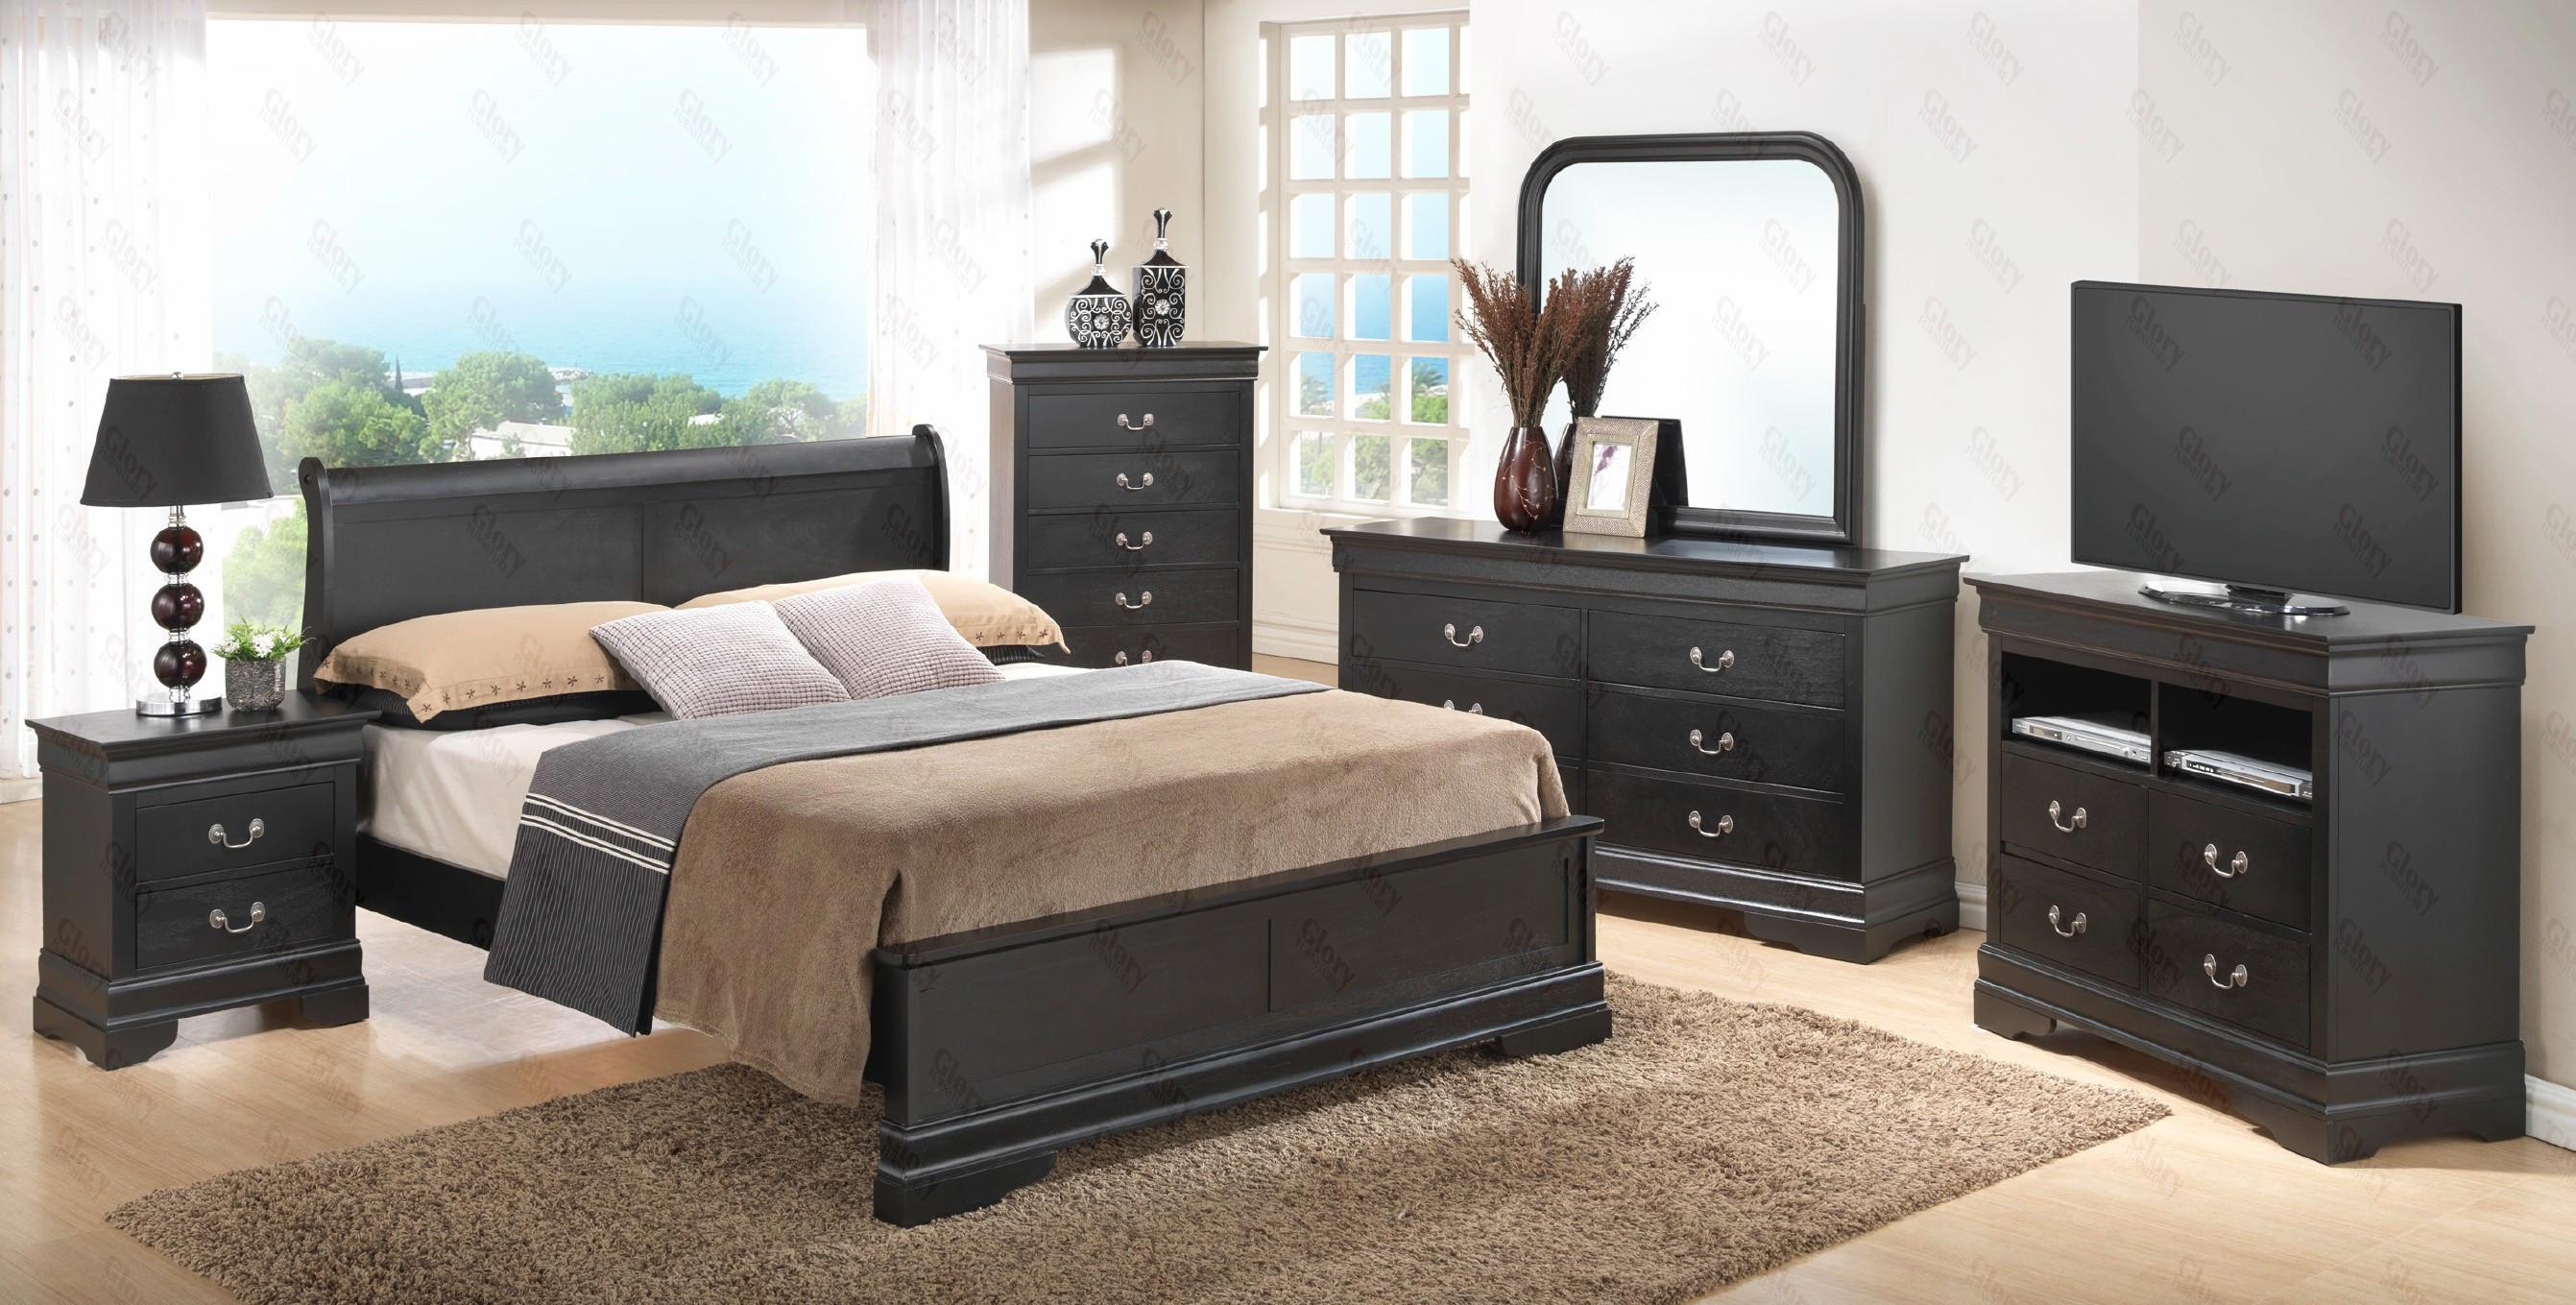 Black wood contemporary bedroom set g3150e glory furniture - Black and wood bedroom furniture ...